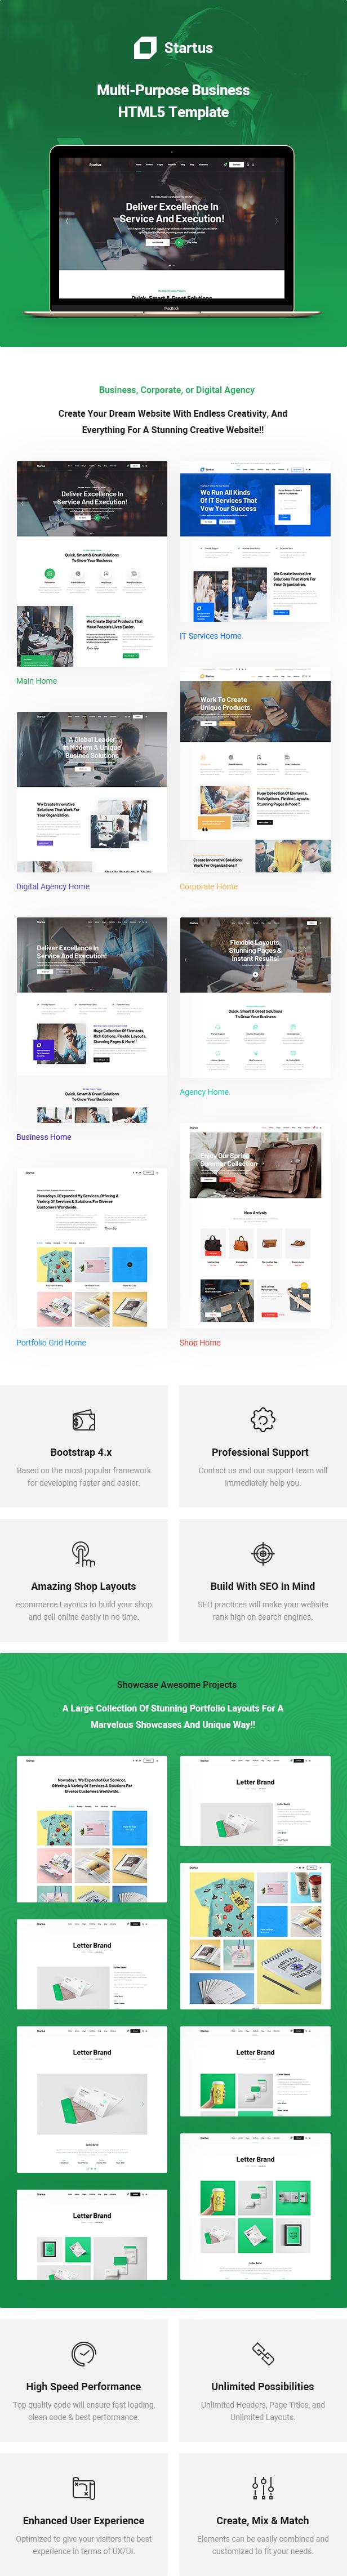 Startus - Multipurpose Business HTML5 Template - 5